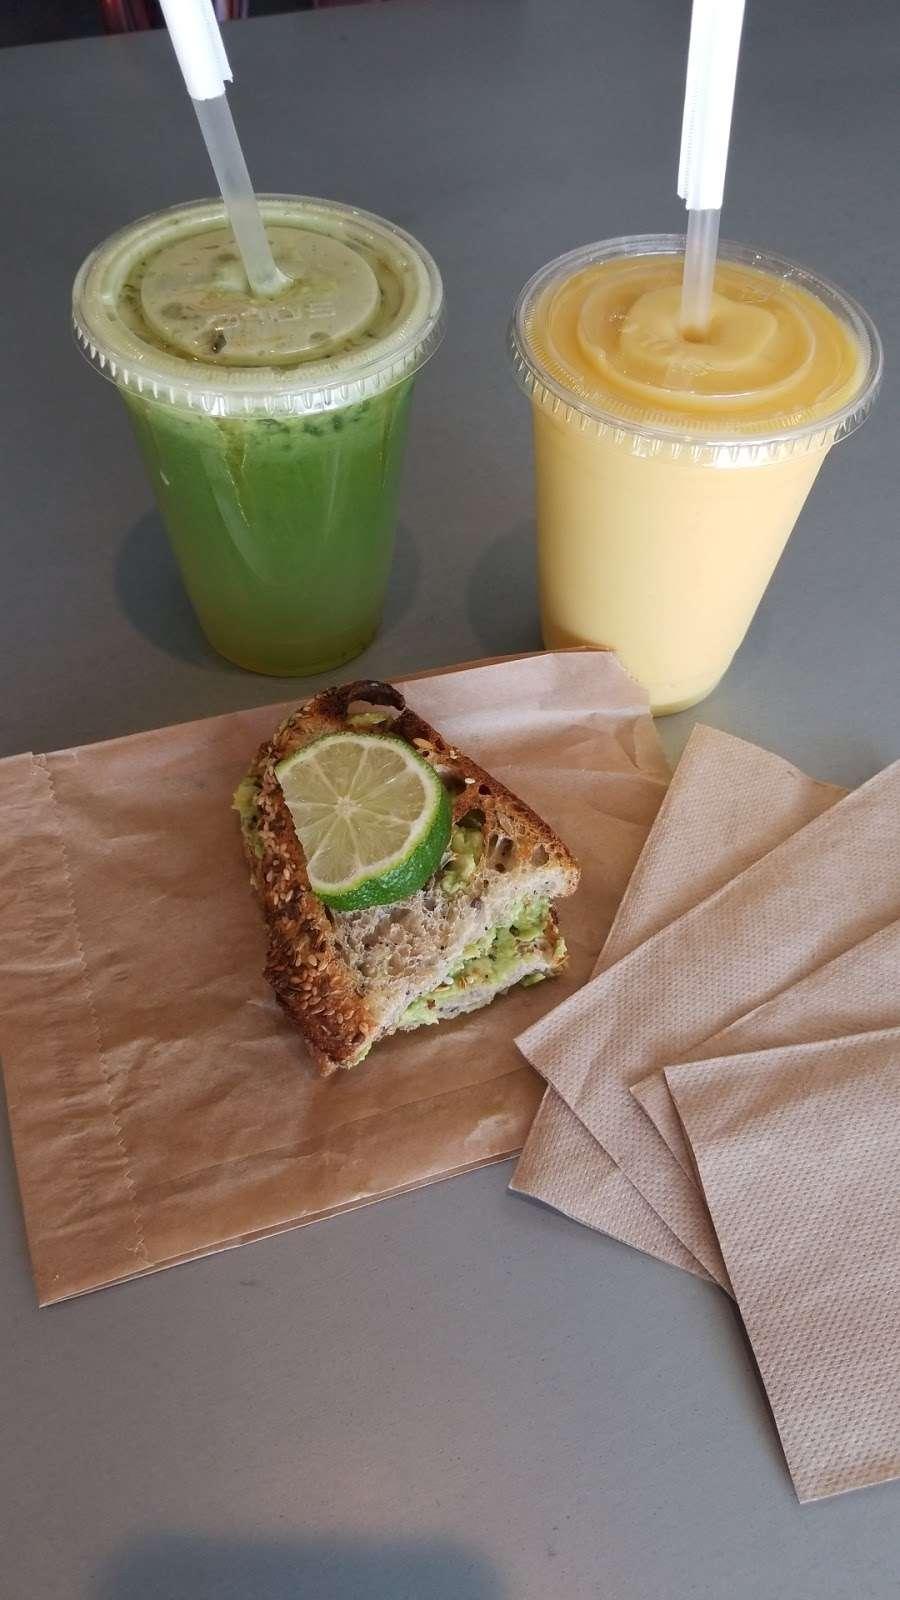 Bee Well Juice Bar & Organic eatery - cafe  | Photo 9 of 10 | Address: 33946 Yucaipa Blvd, Yucaipa, CA 92399, USA | Phone: (909) 790-9097